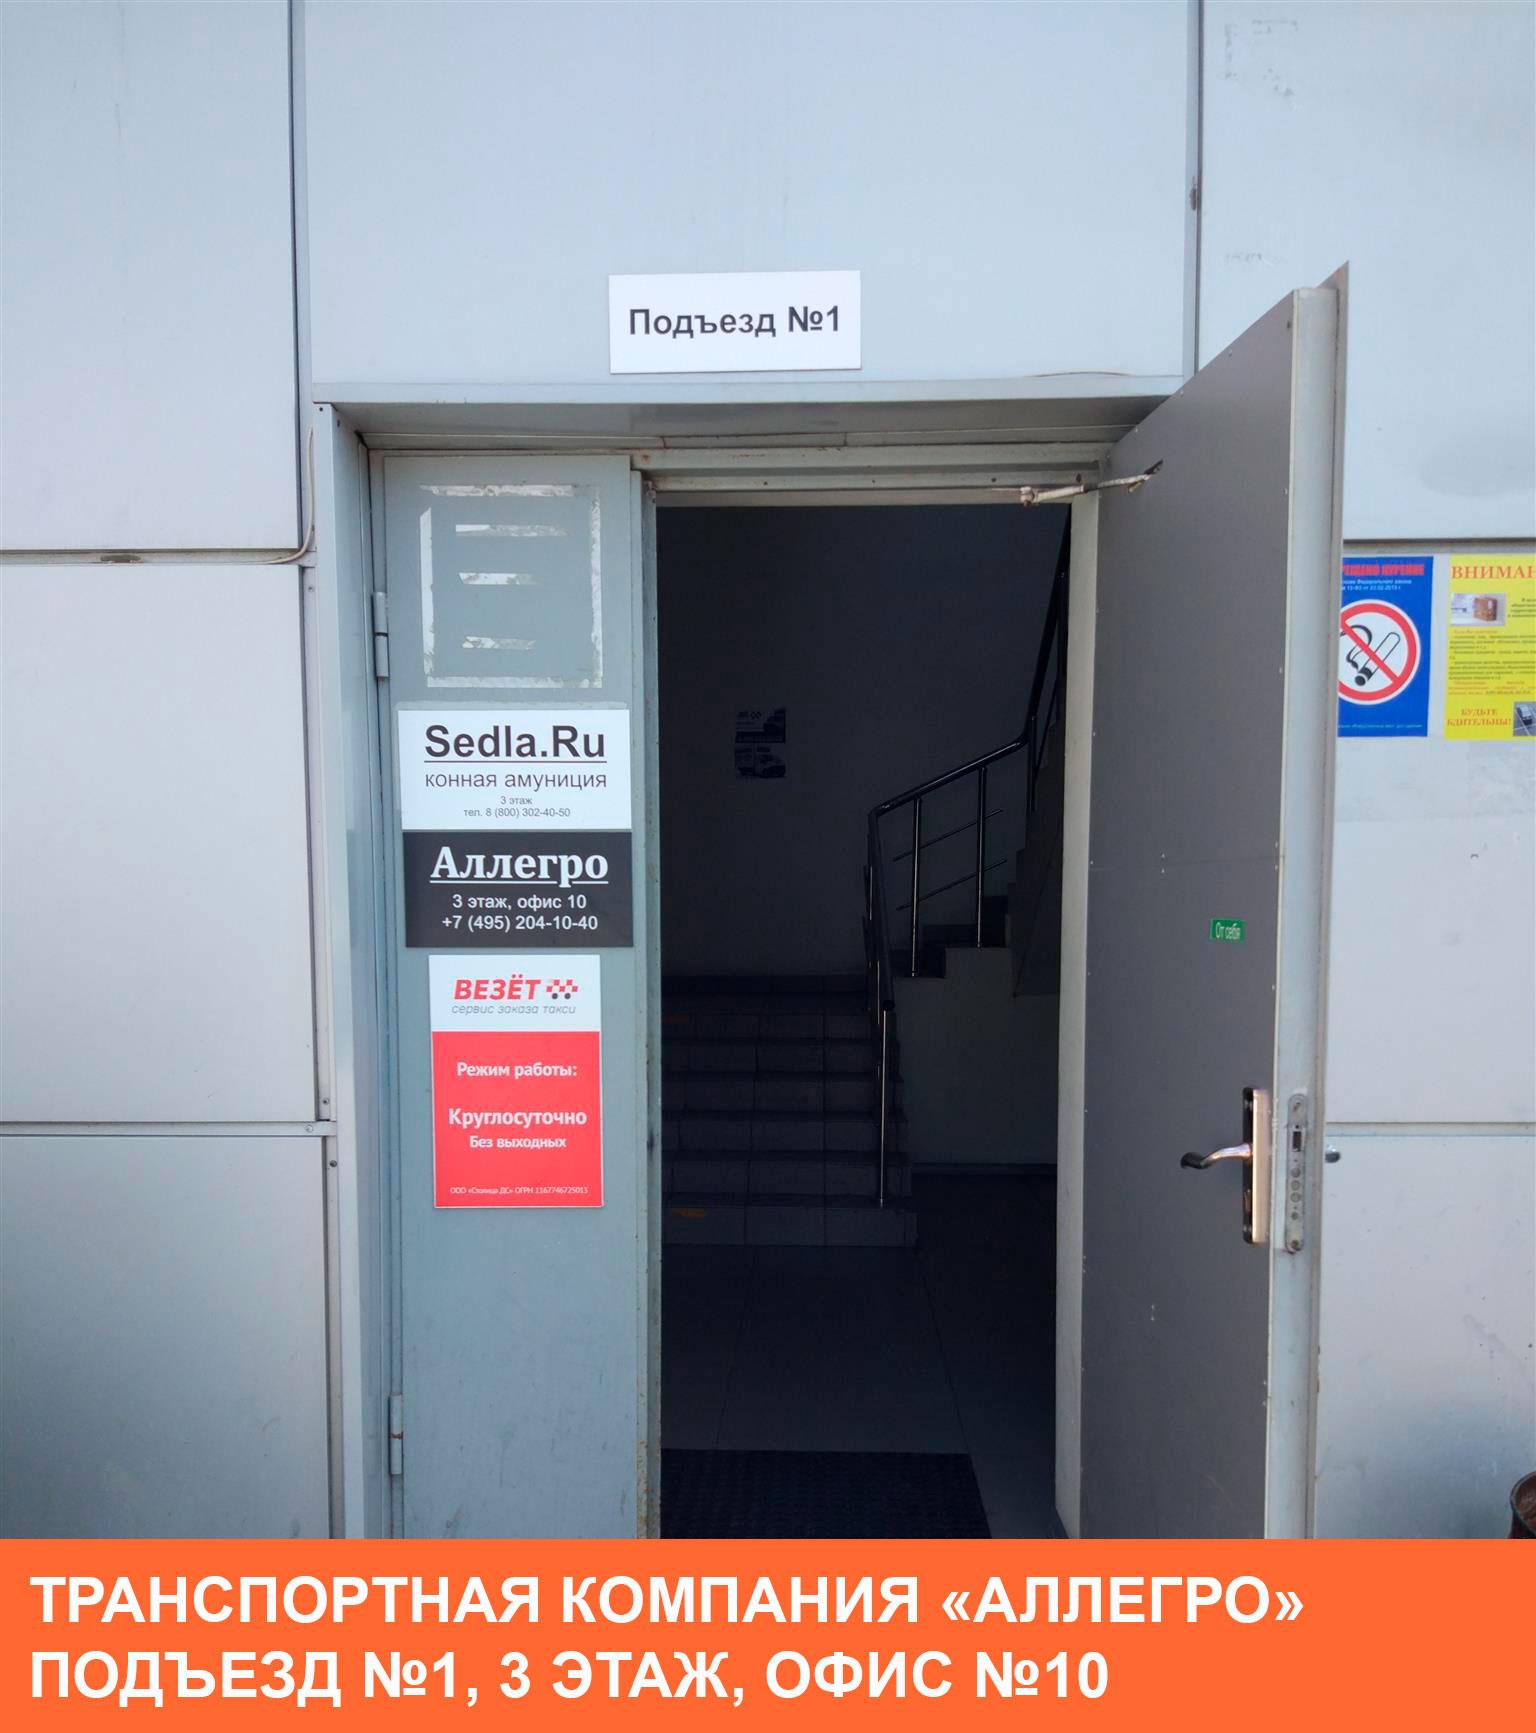 path 9 - Контакты транспортной компании Аллегро